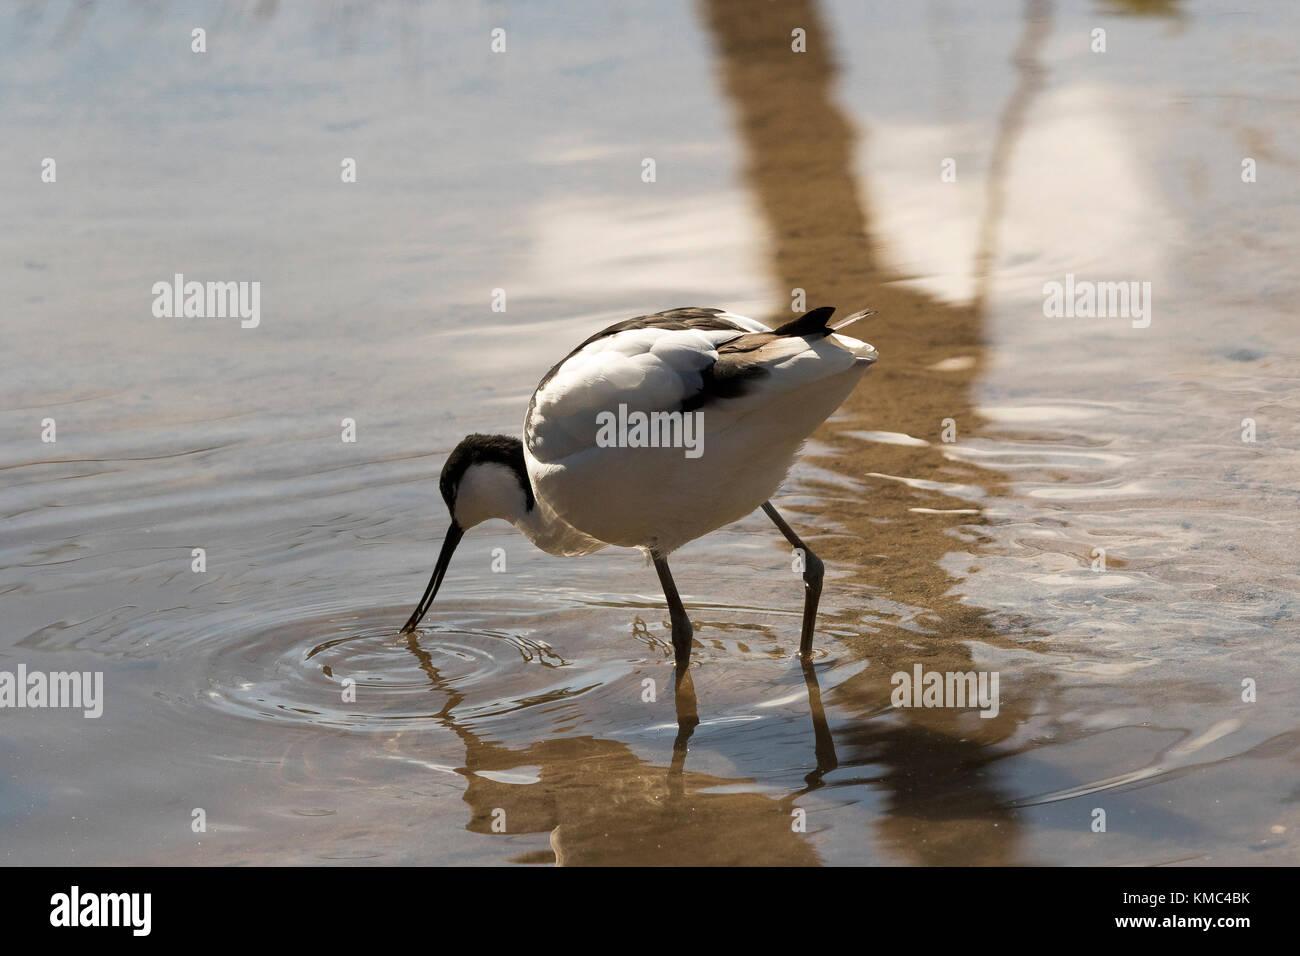 A wading avocet, Recurvirostridae, Recurvirostra avosetta - Stock Image